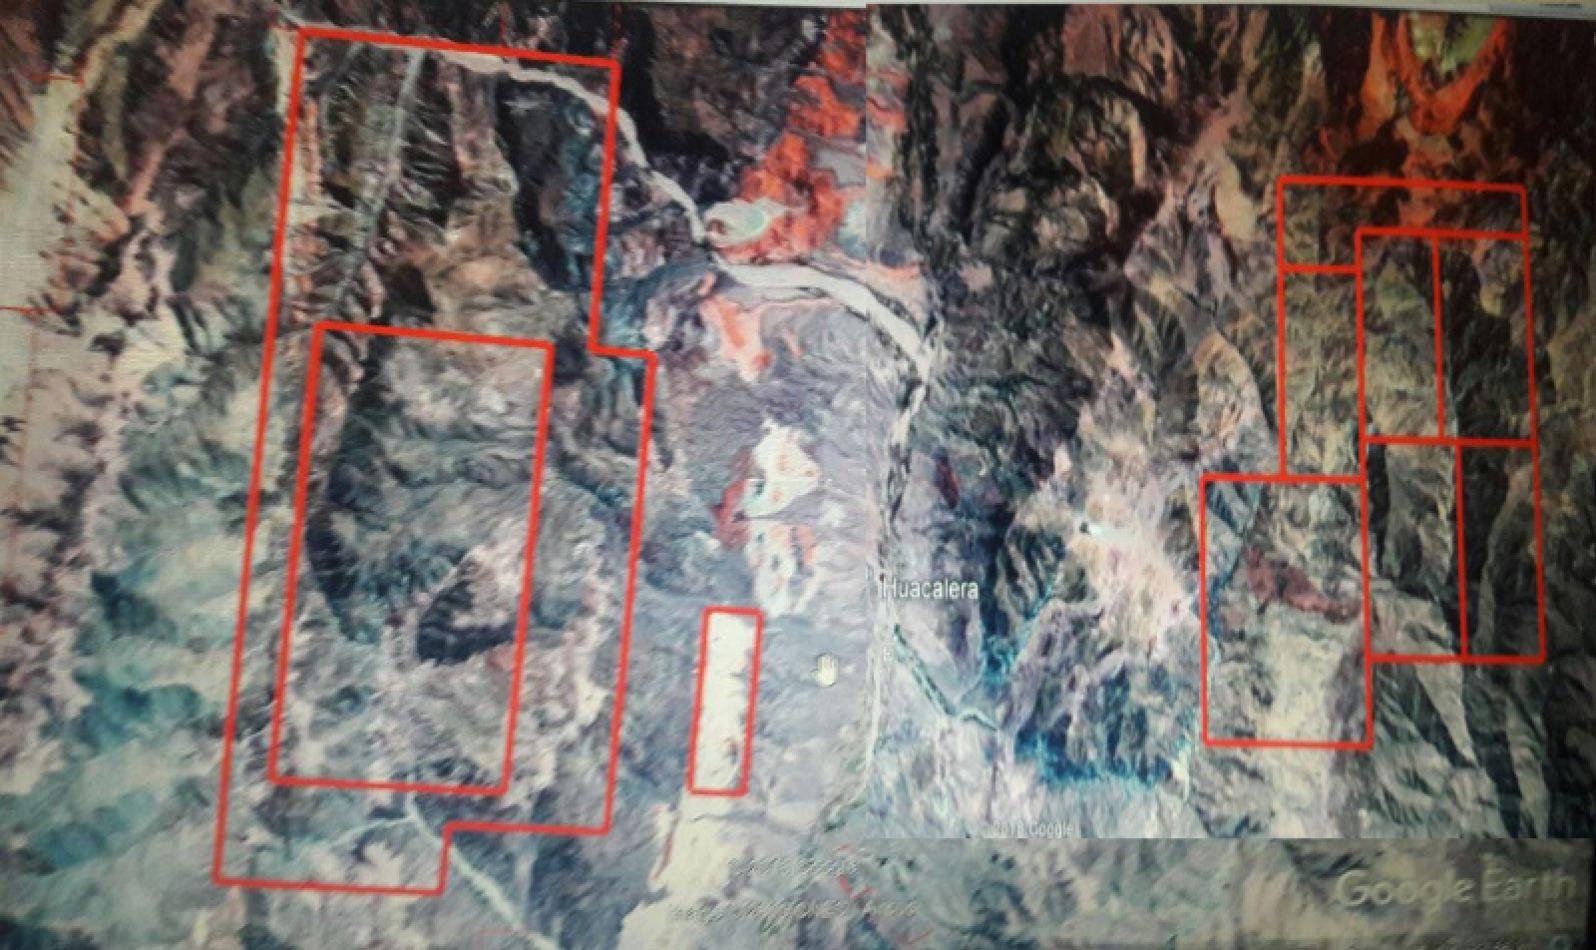 Huacalera. Zonas con pedidos de explotación minera.